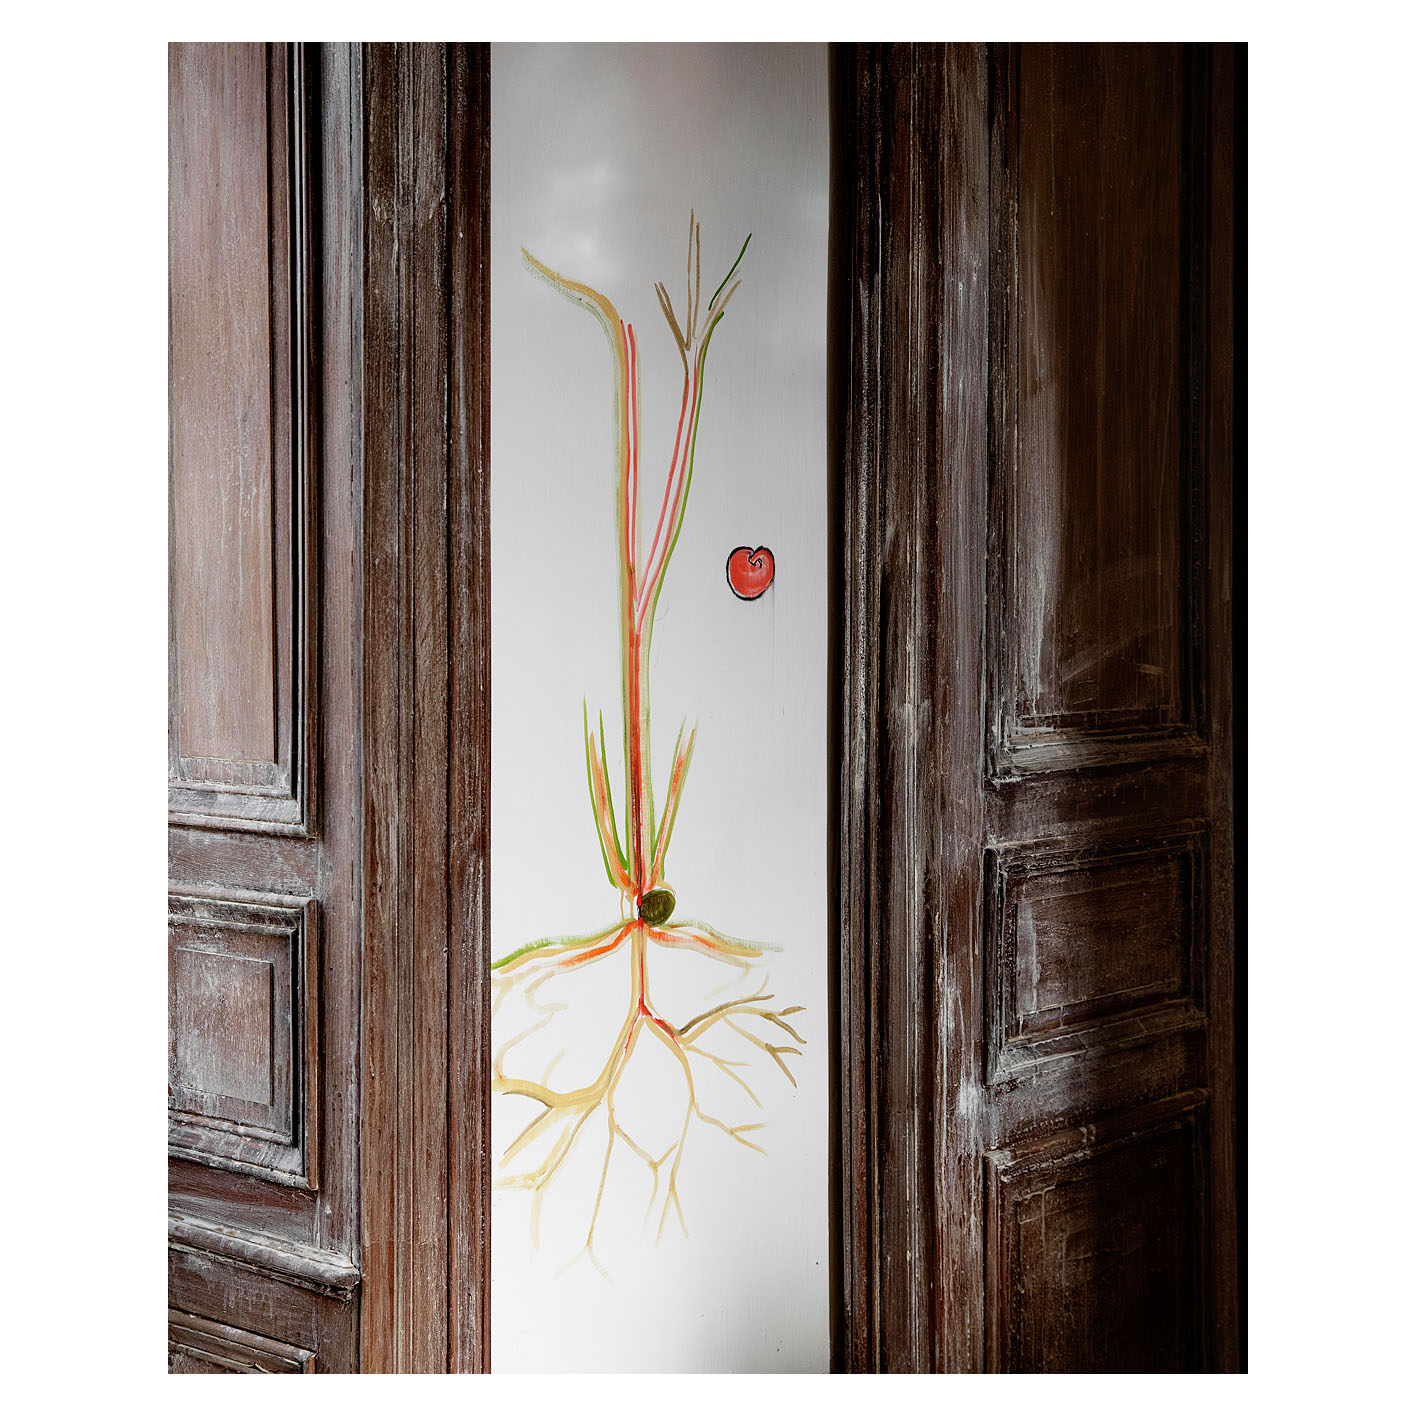 Peinture de Fabrice Hyber sur le mur d'un bureau de sa propriété en Vendée.